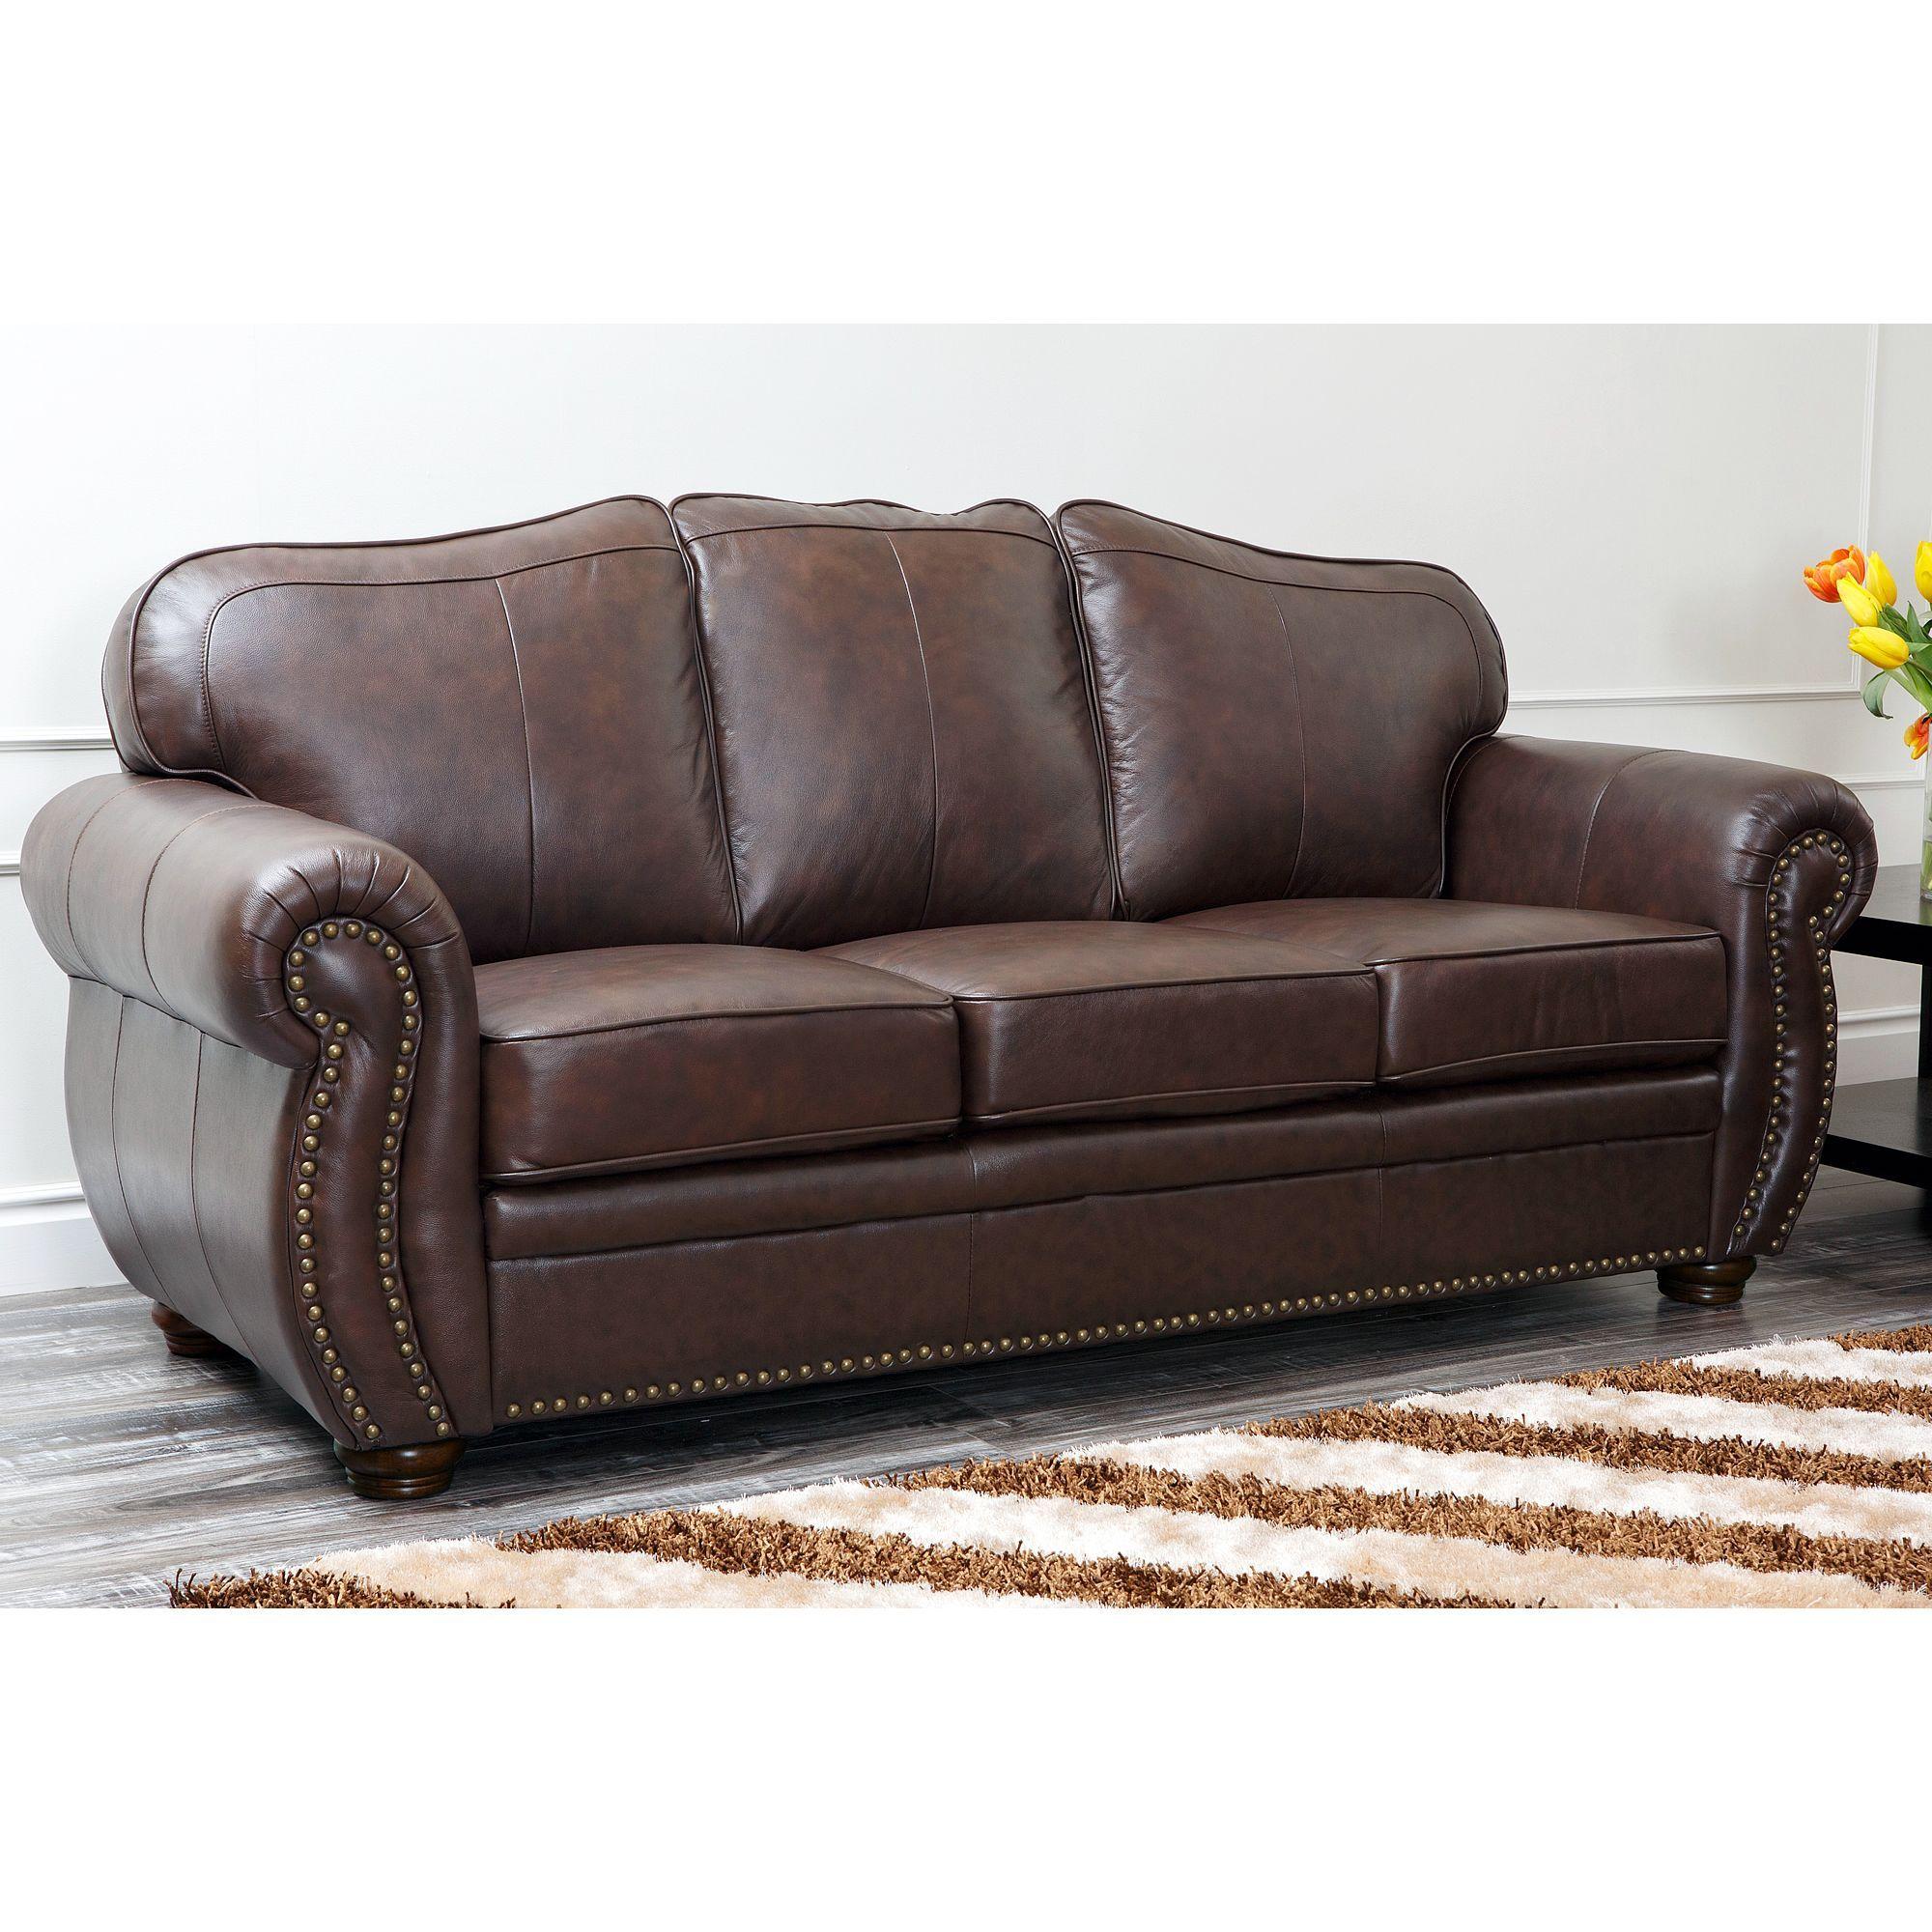 Online Shopping Bedding Furniture Electronics Jewelry Clothing More Leather Sofa Set Italian Leather Sofa Leather Sofa